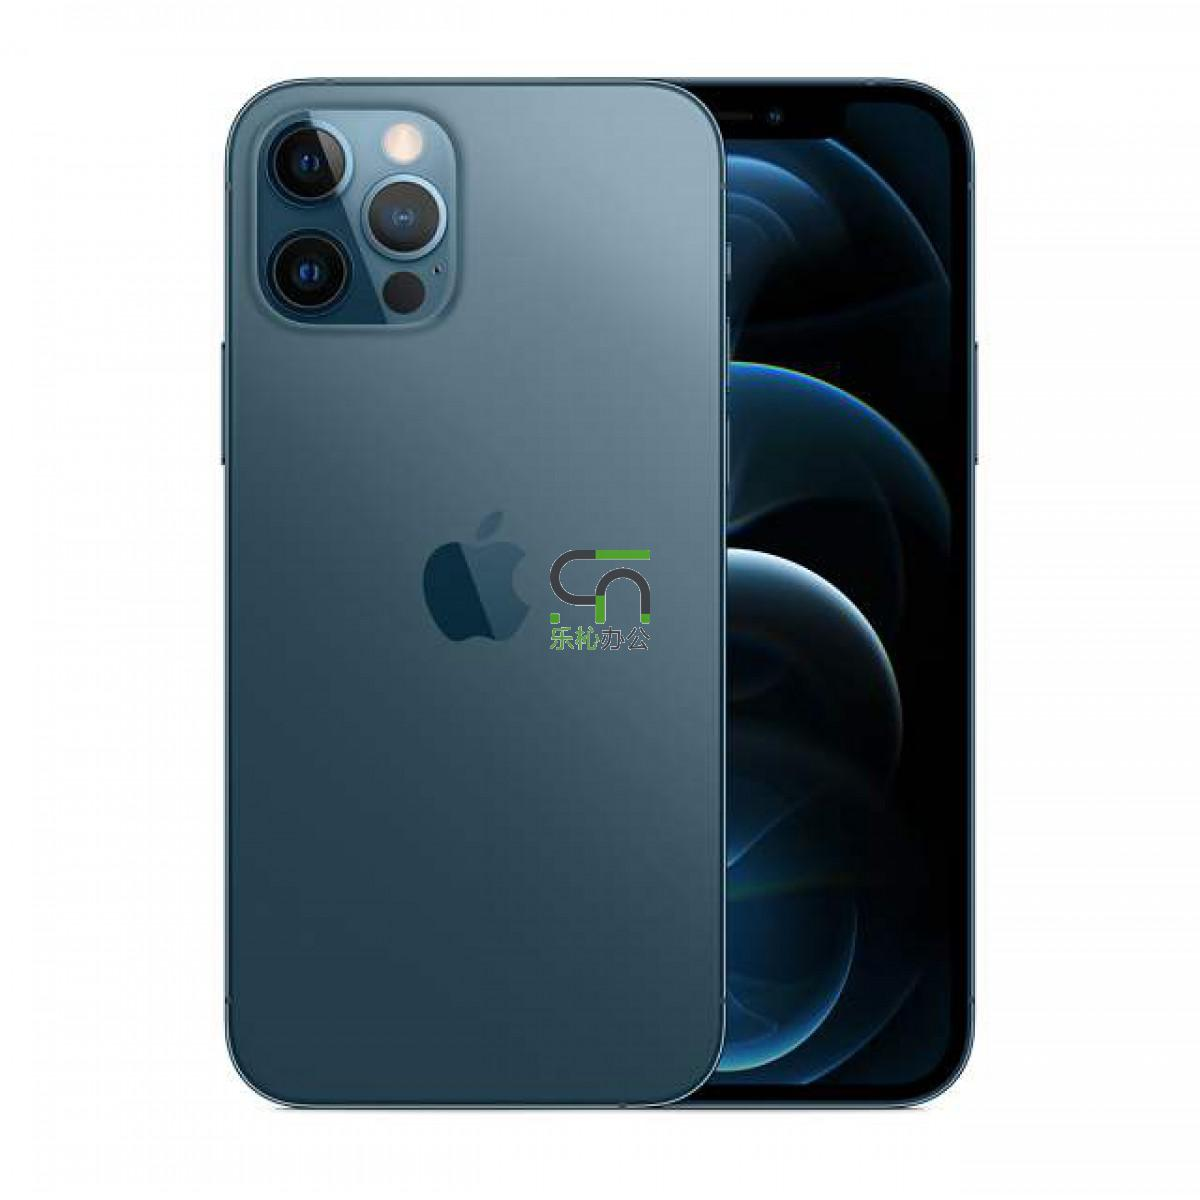 Apple iPhone 12 Pro Max  支持移动联通电信5G 双卡双待手机